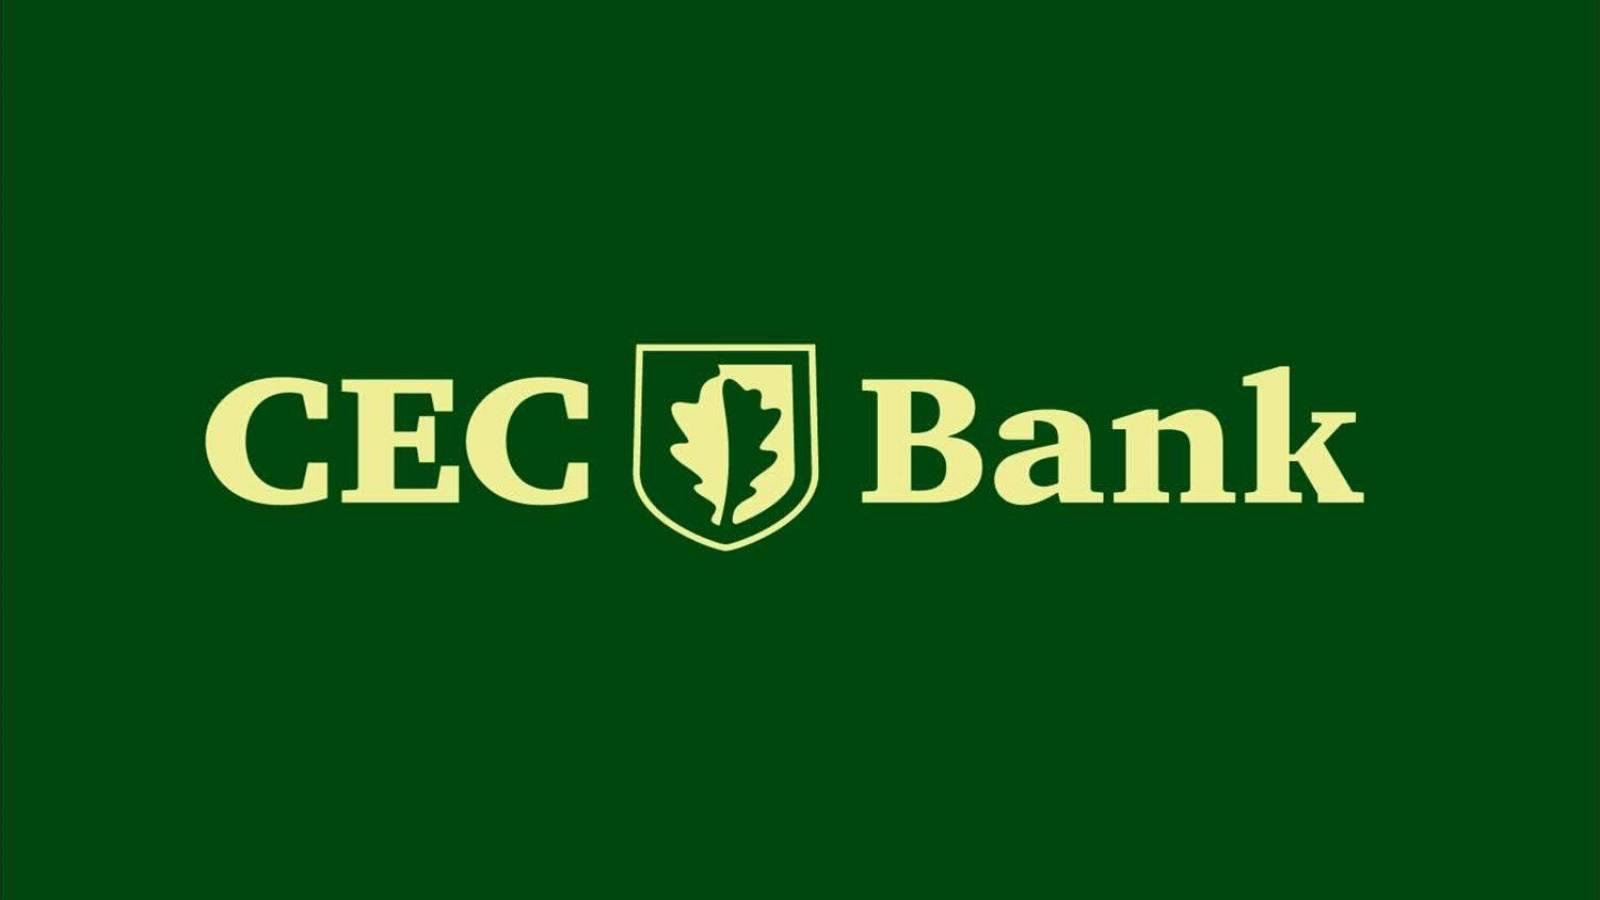 cec bank modern